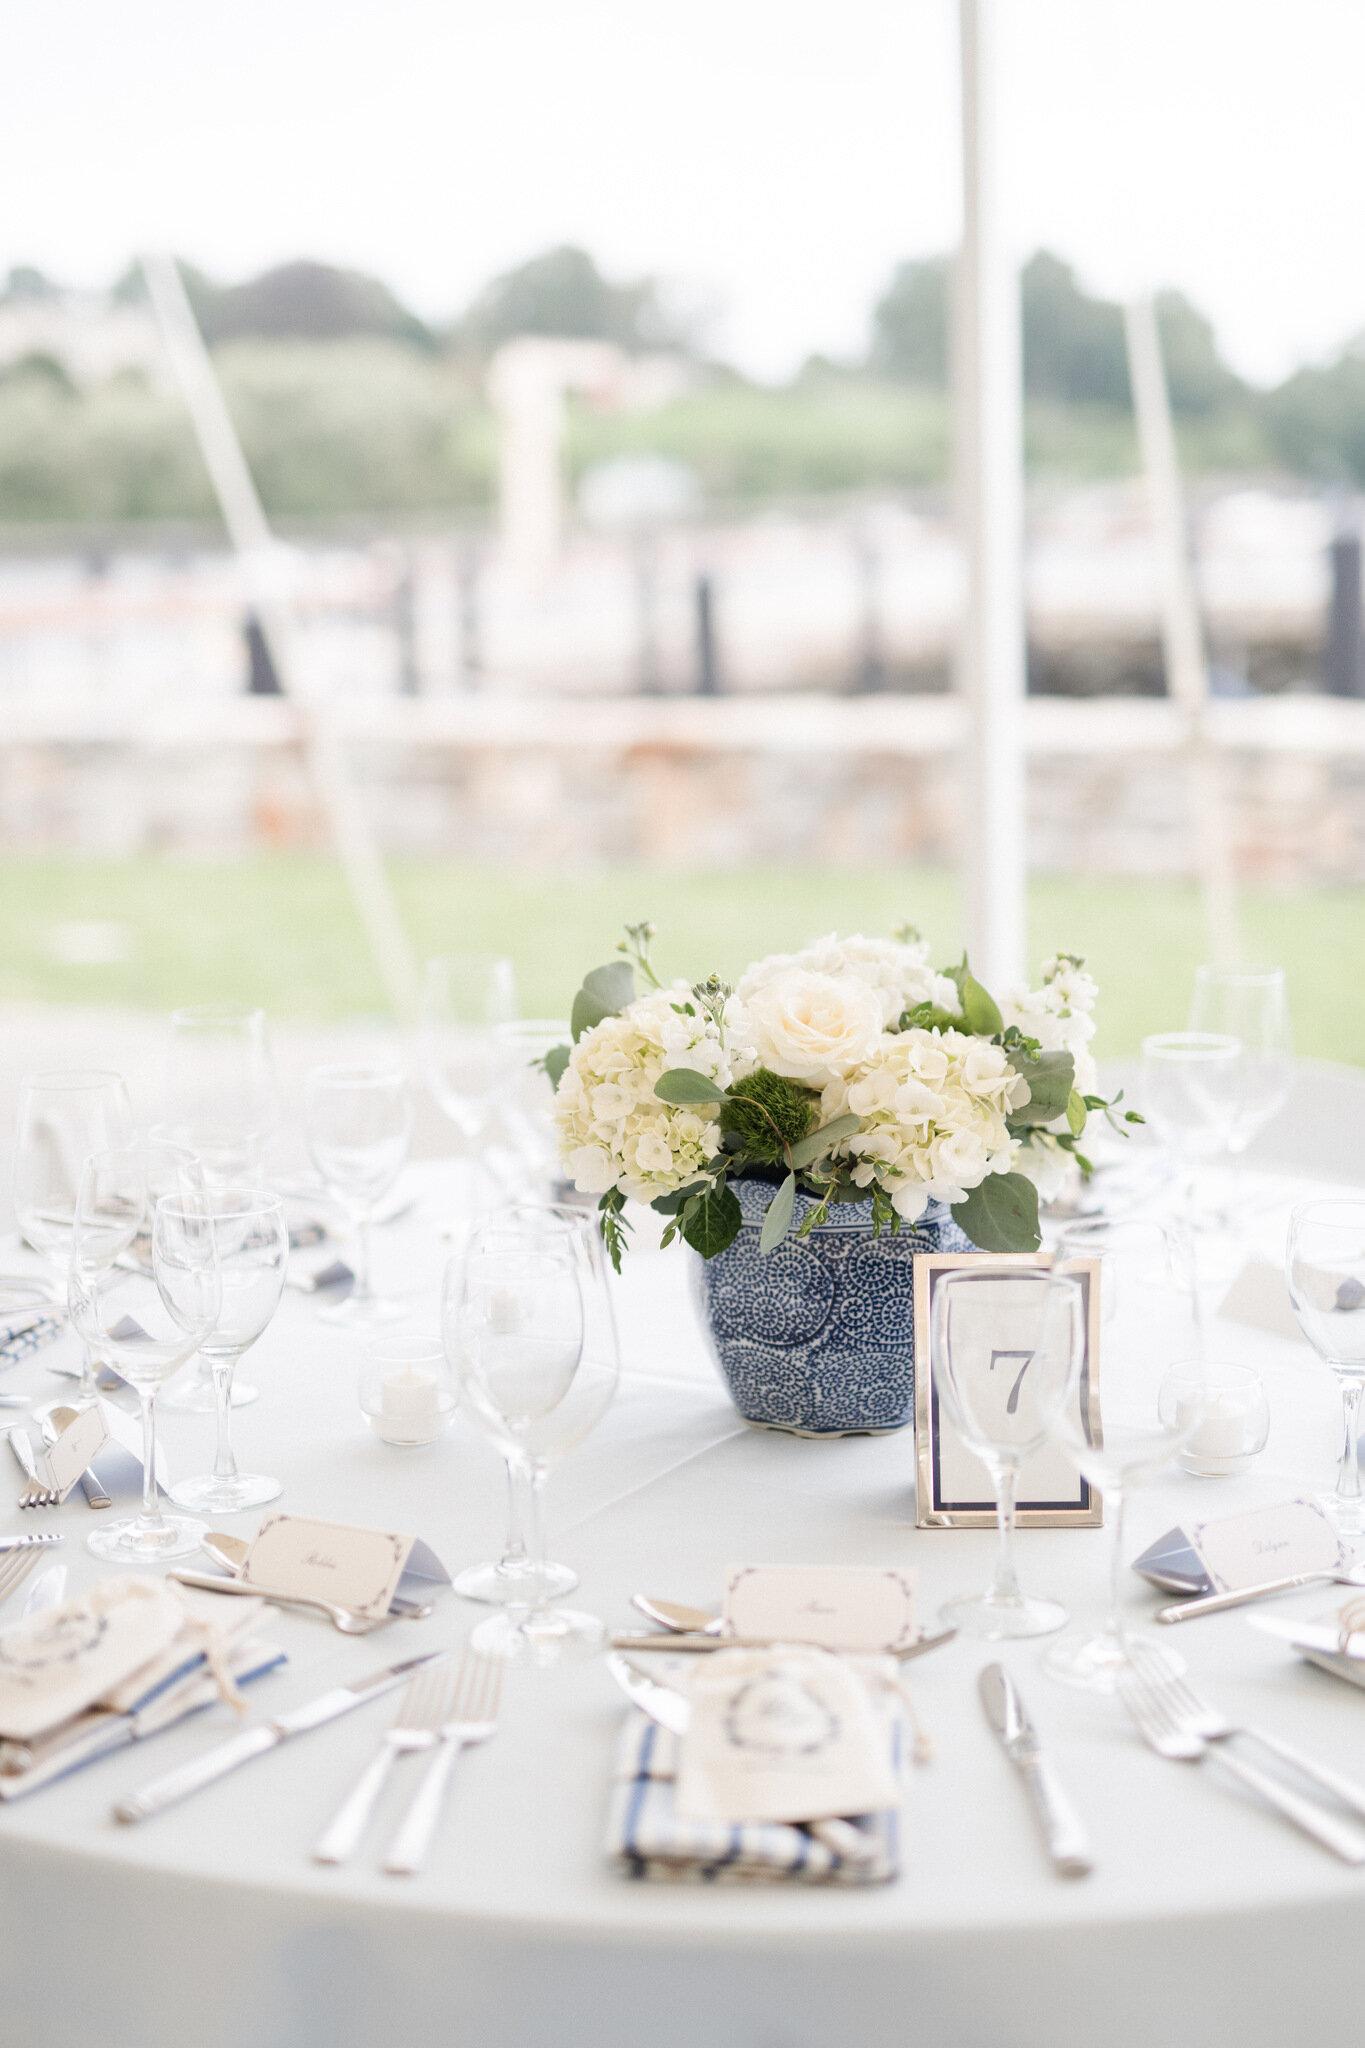 greenwich wedding_belle haven club wedding _ct wedding photographer-34_Easy-Resize.com.jpg